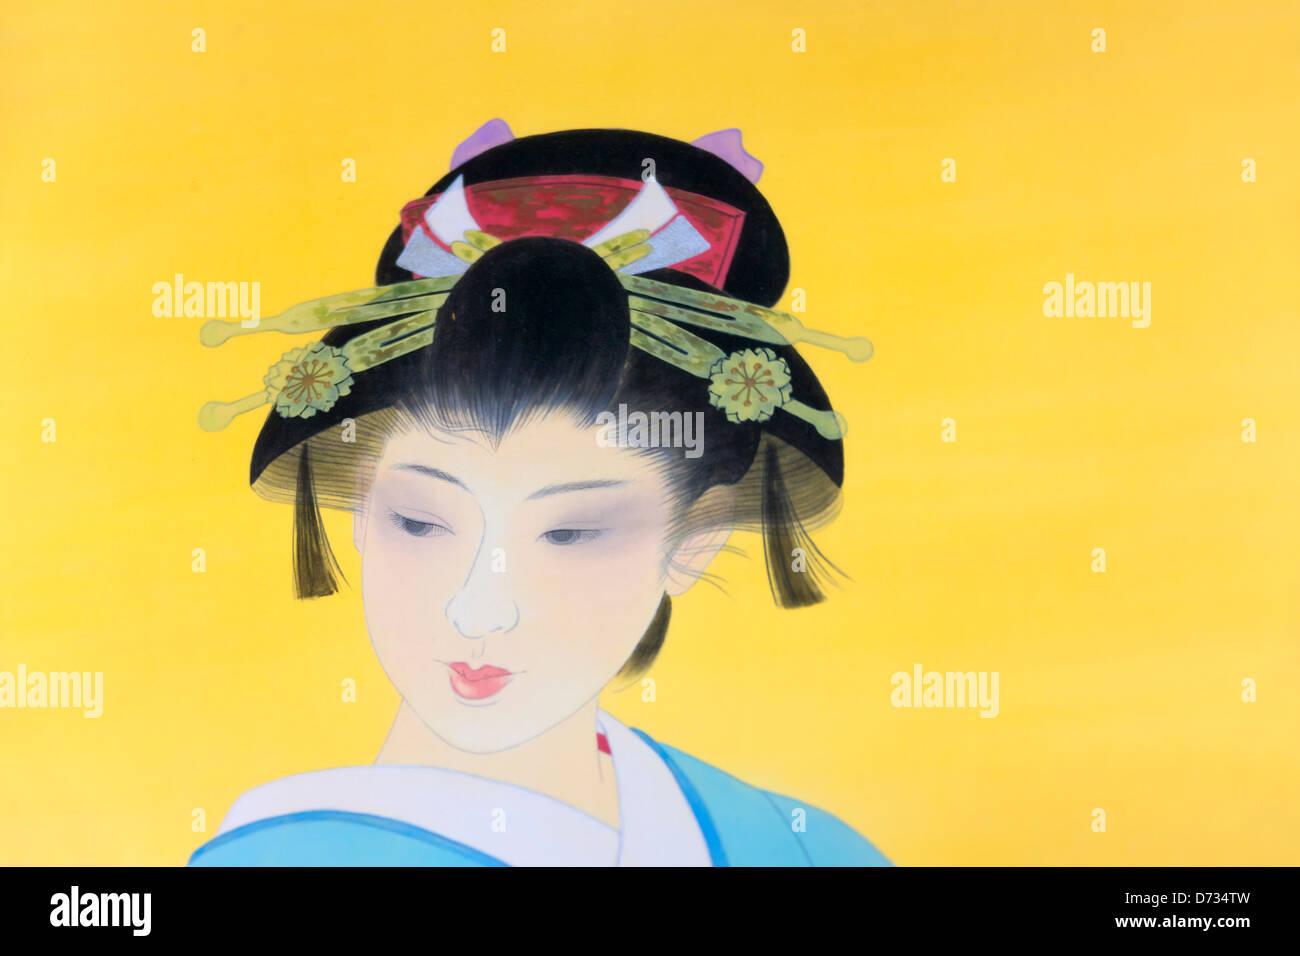 Ukiyo-e wood block prints of traditional Japanese ladies, Japan - Stock Image